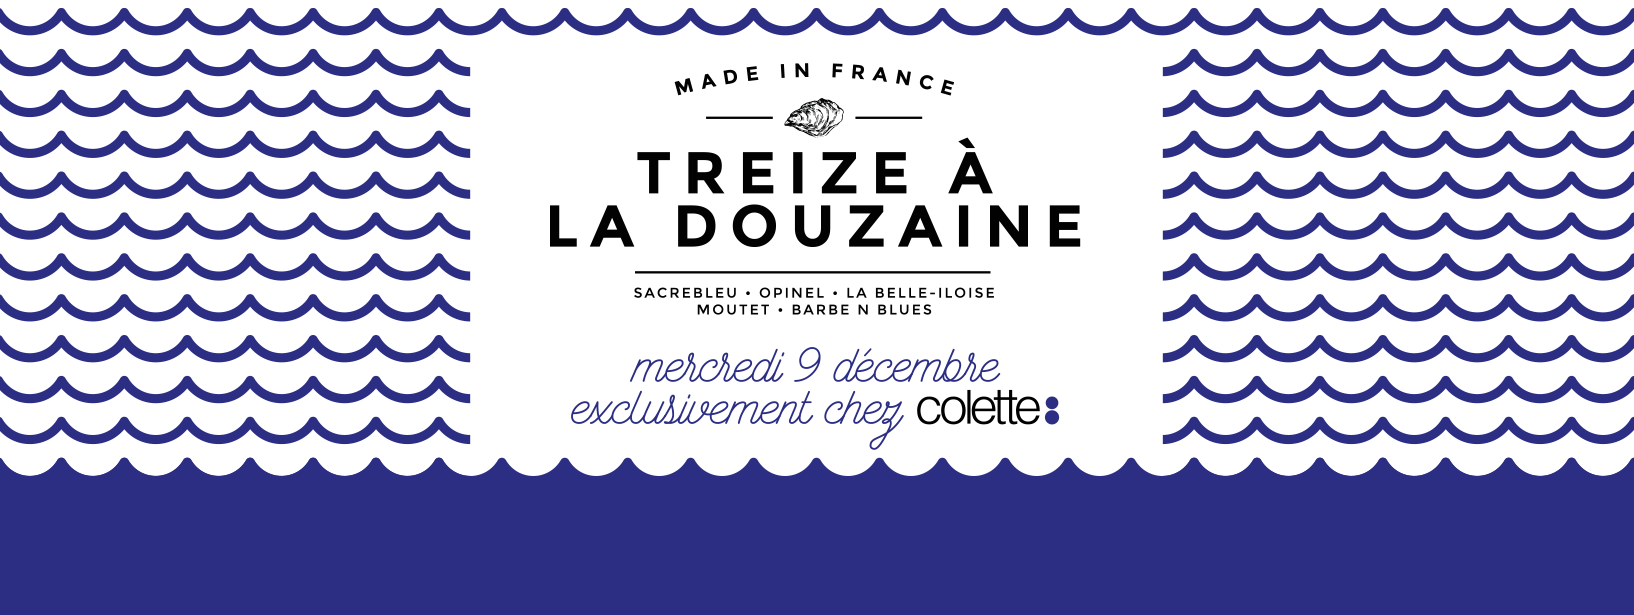 MOUTET & SACREBLEU - partenariat de marques - 2015